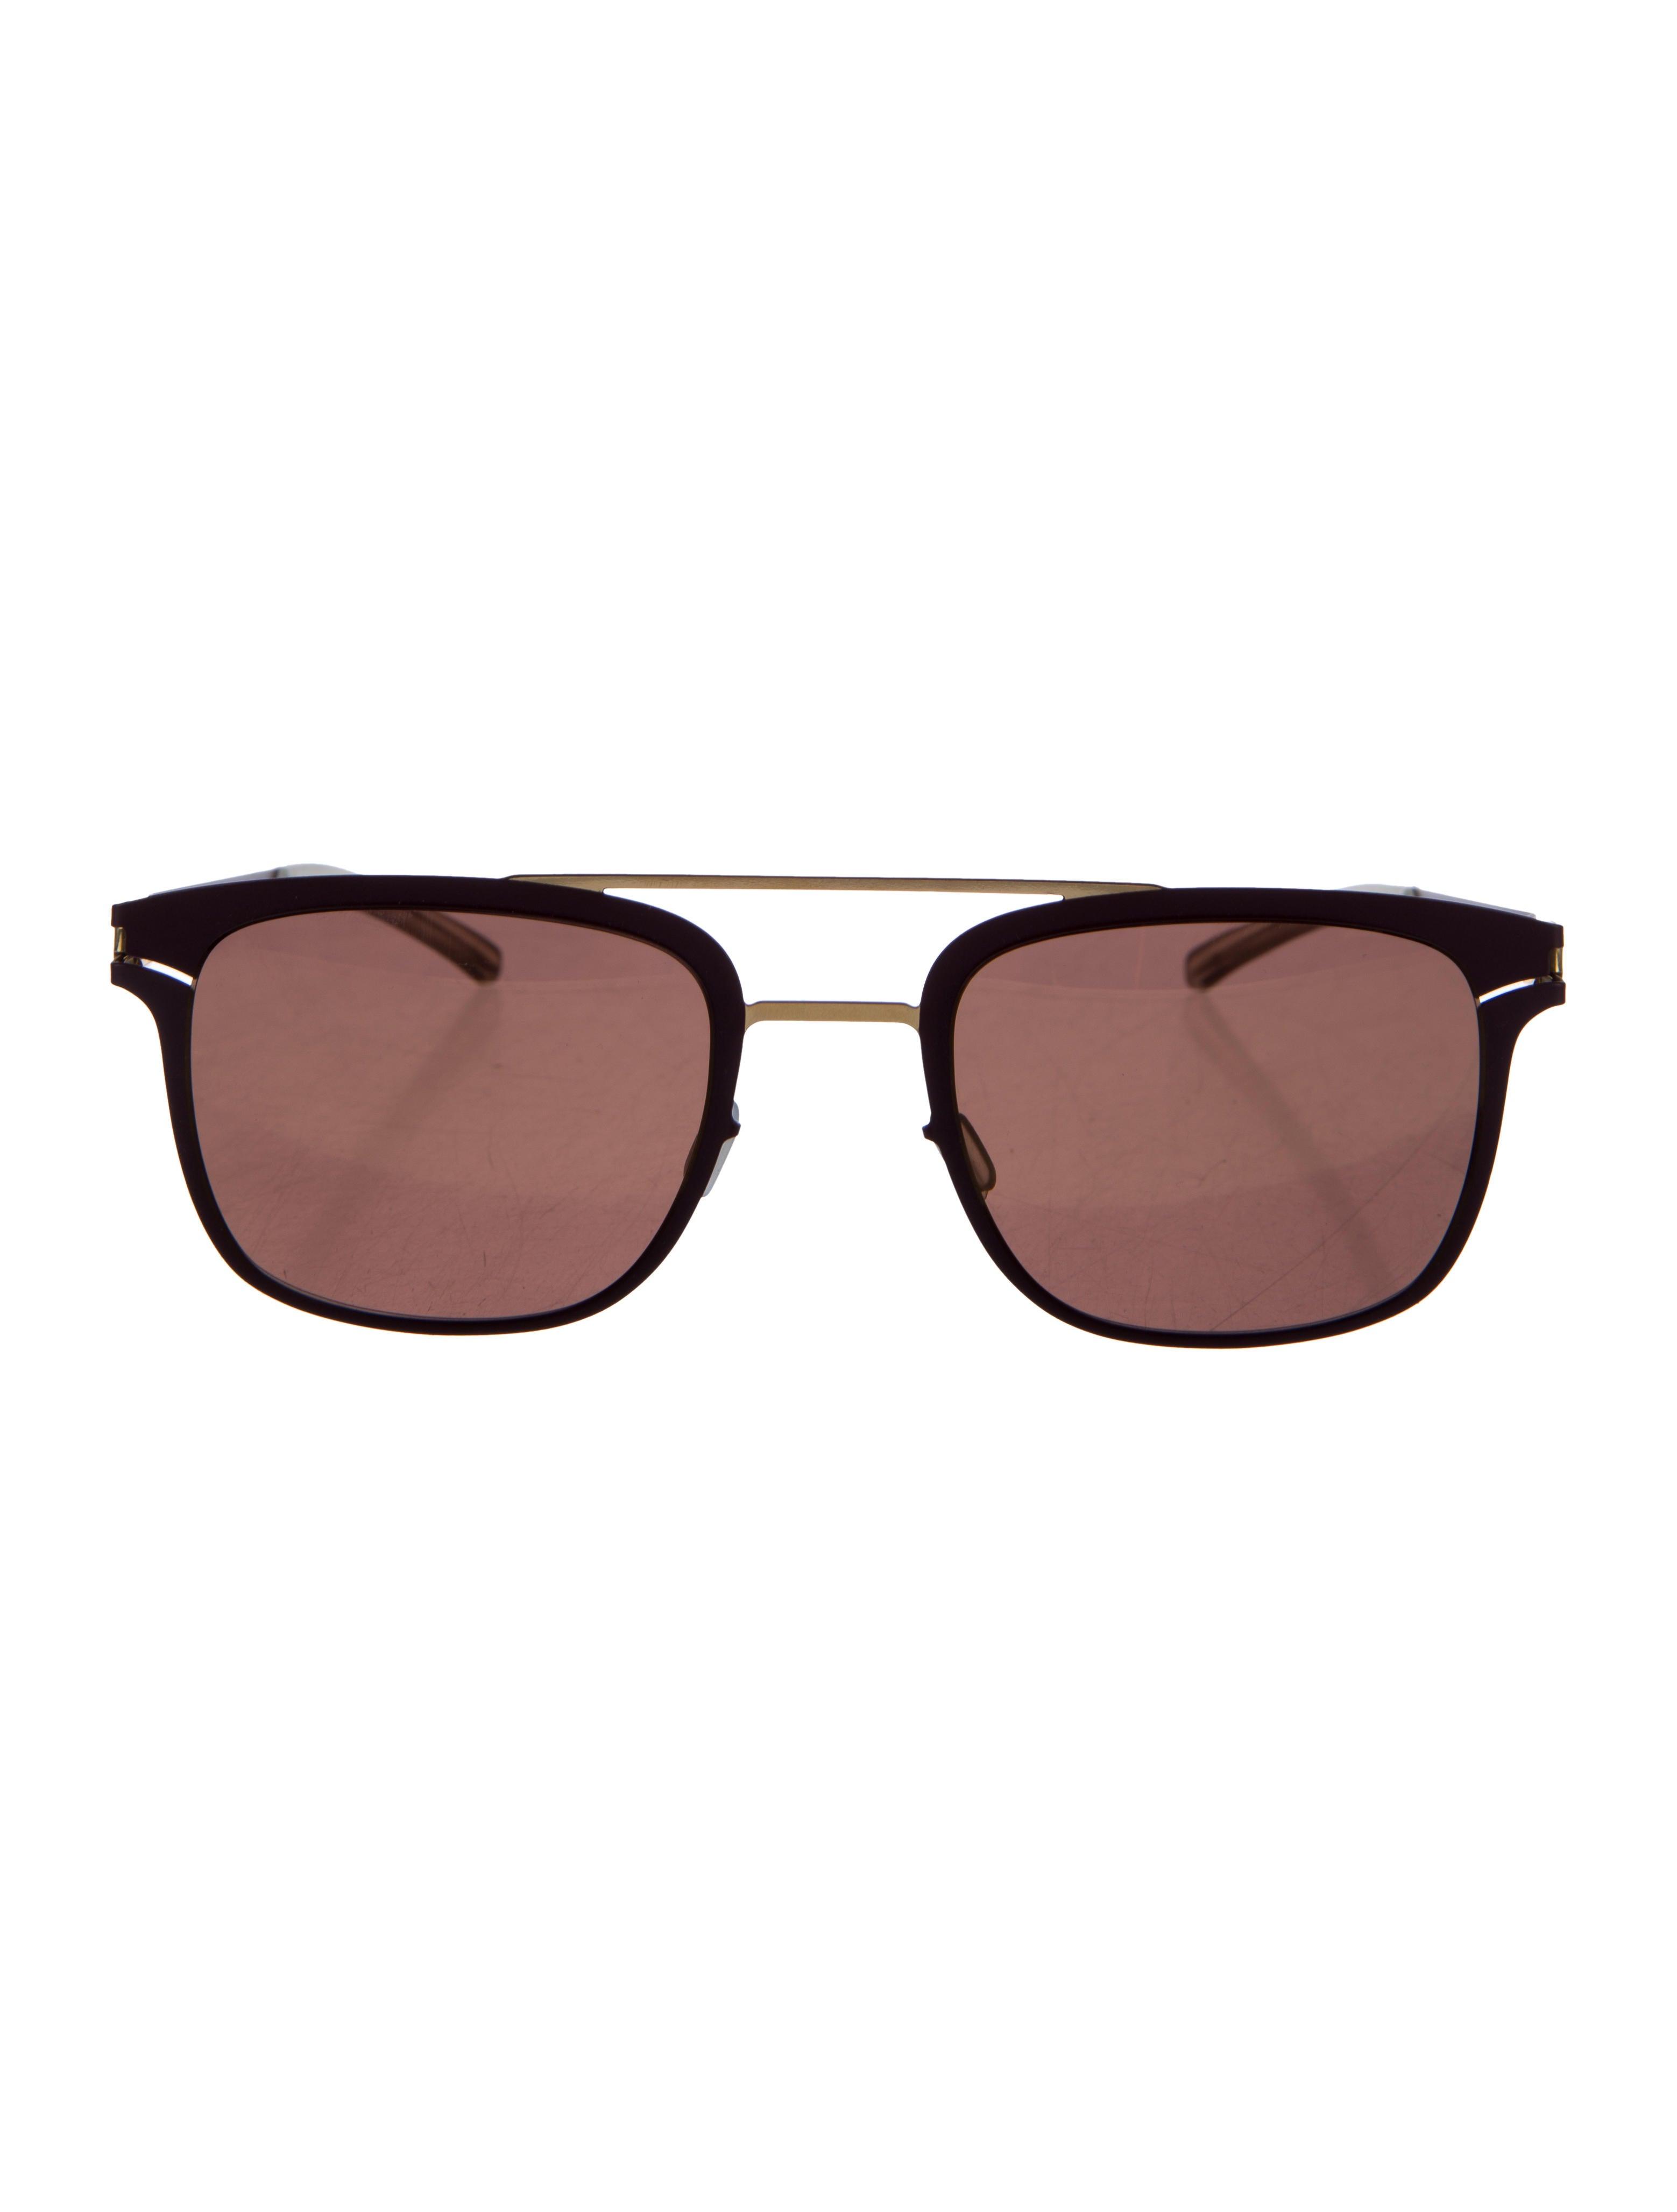 59103c65494 Mykita Decades Hunter Sunglasses - Accessories - MYK20042